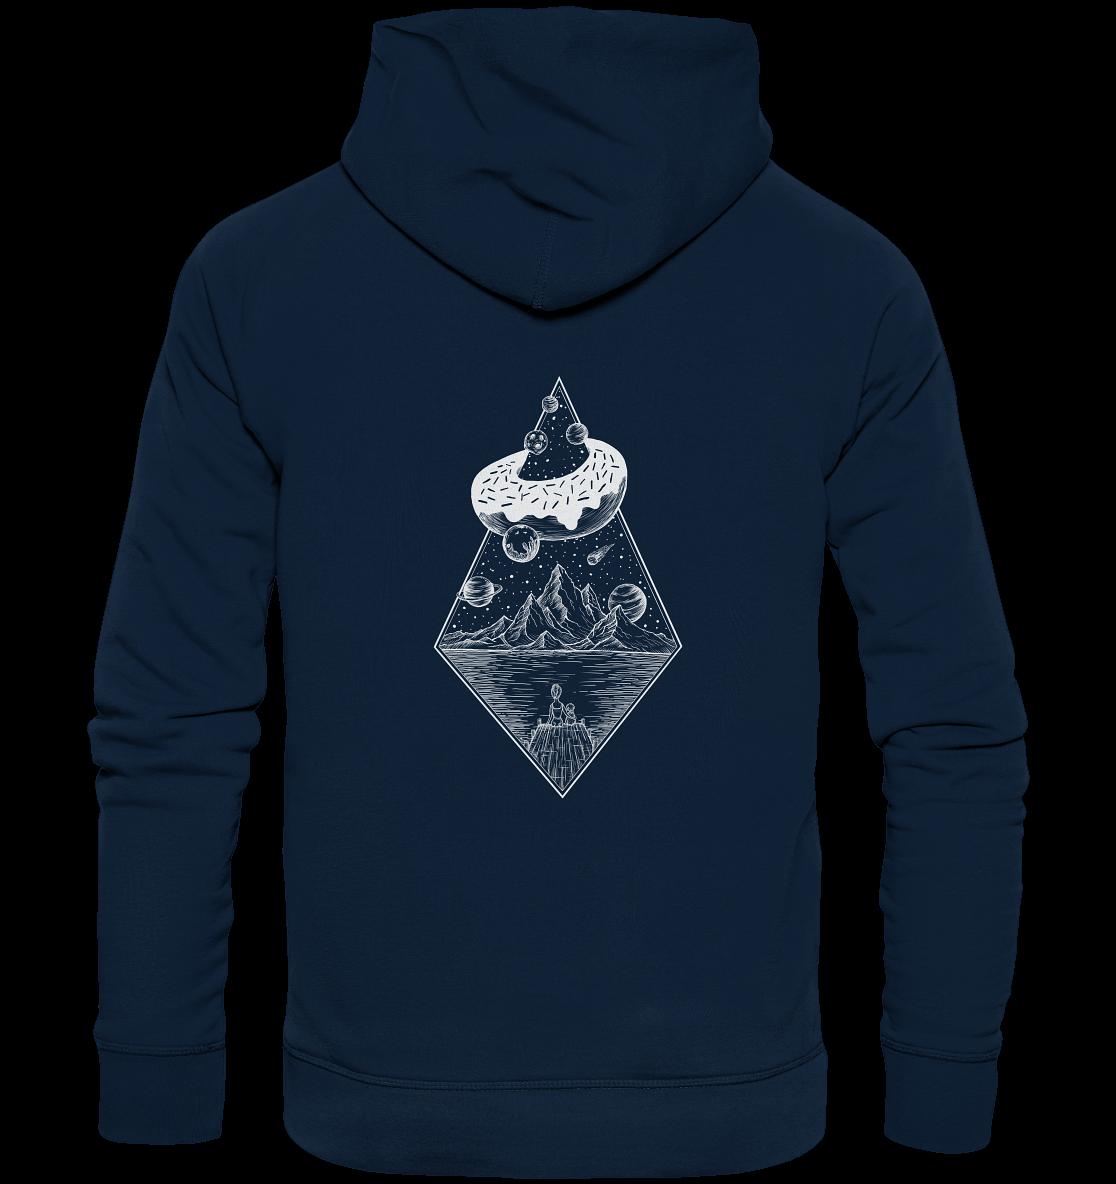 back-organic-fashion-hoodie-0e2035-1116x.png